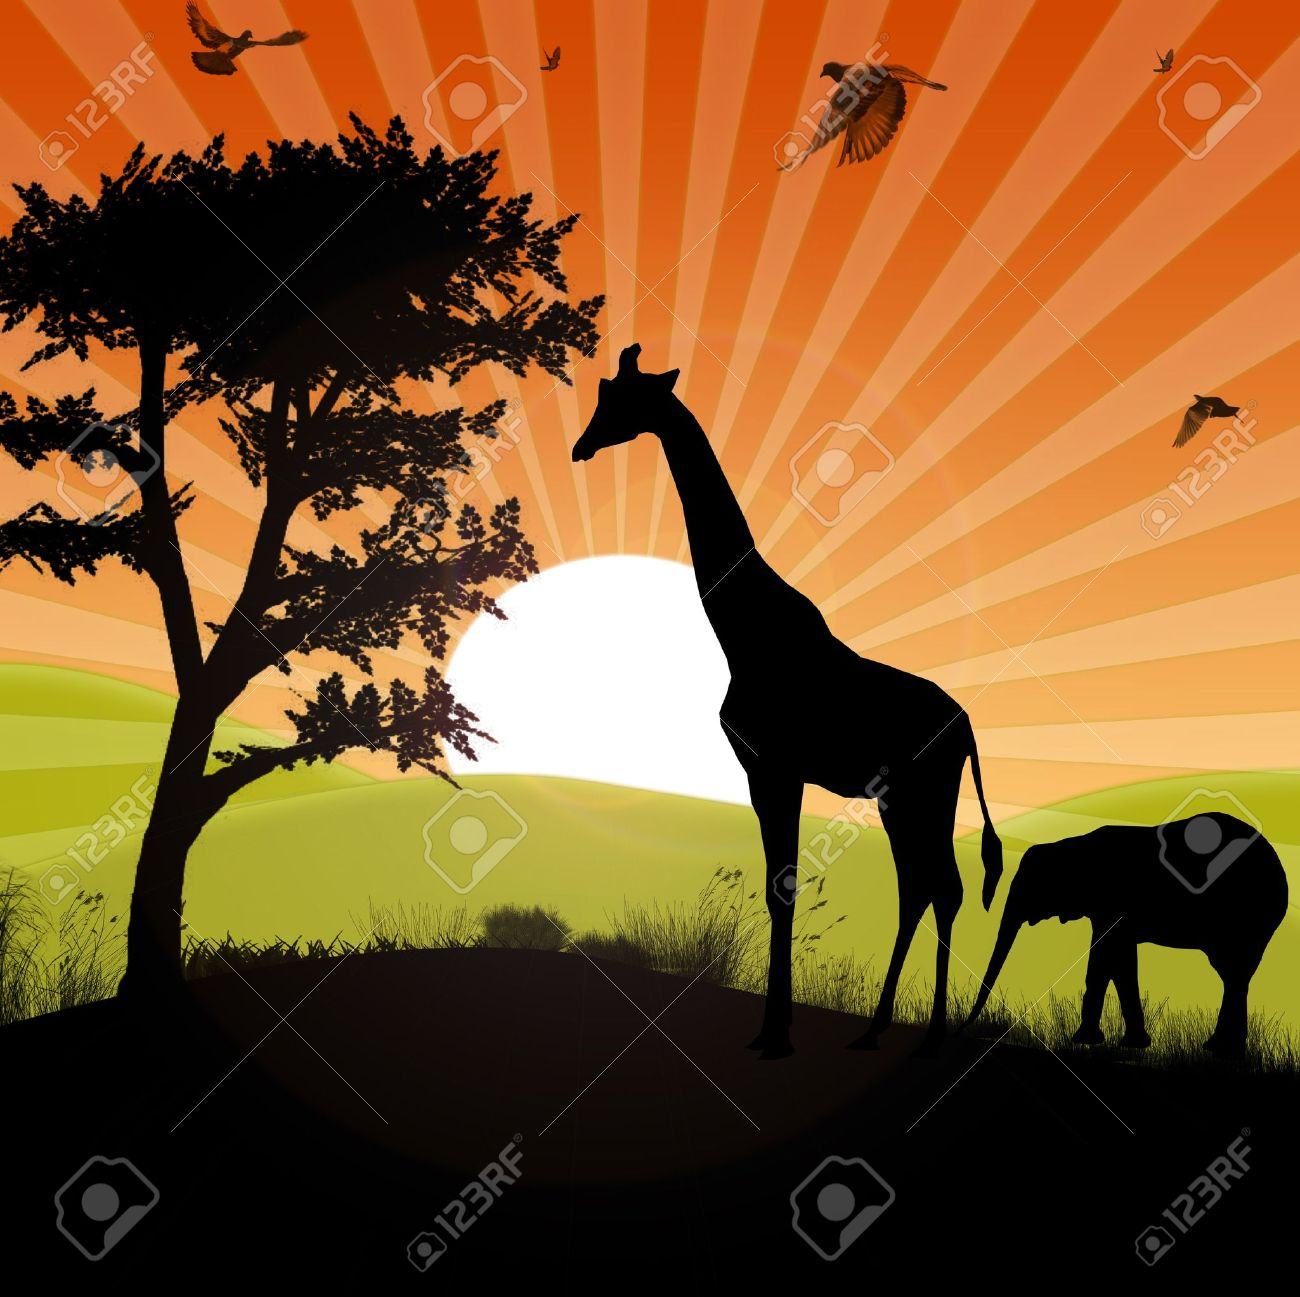 safari animals silhouette in an afican sunset landscape Stock Photo - 8712042